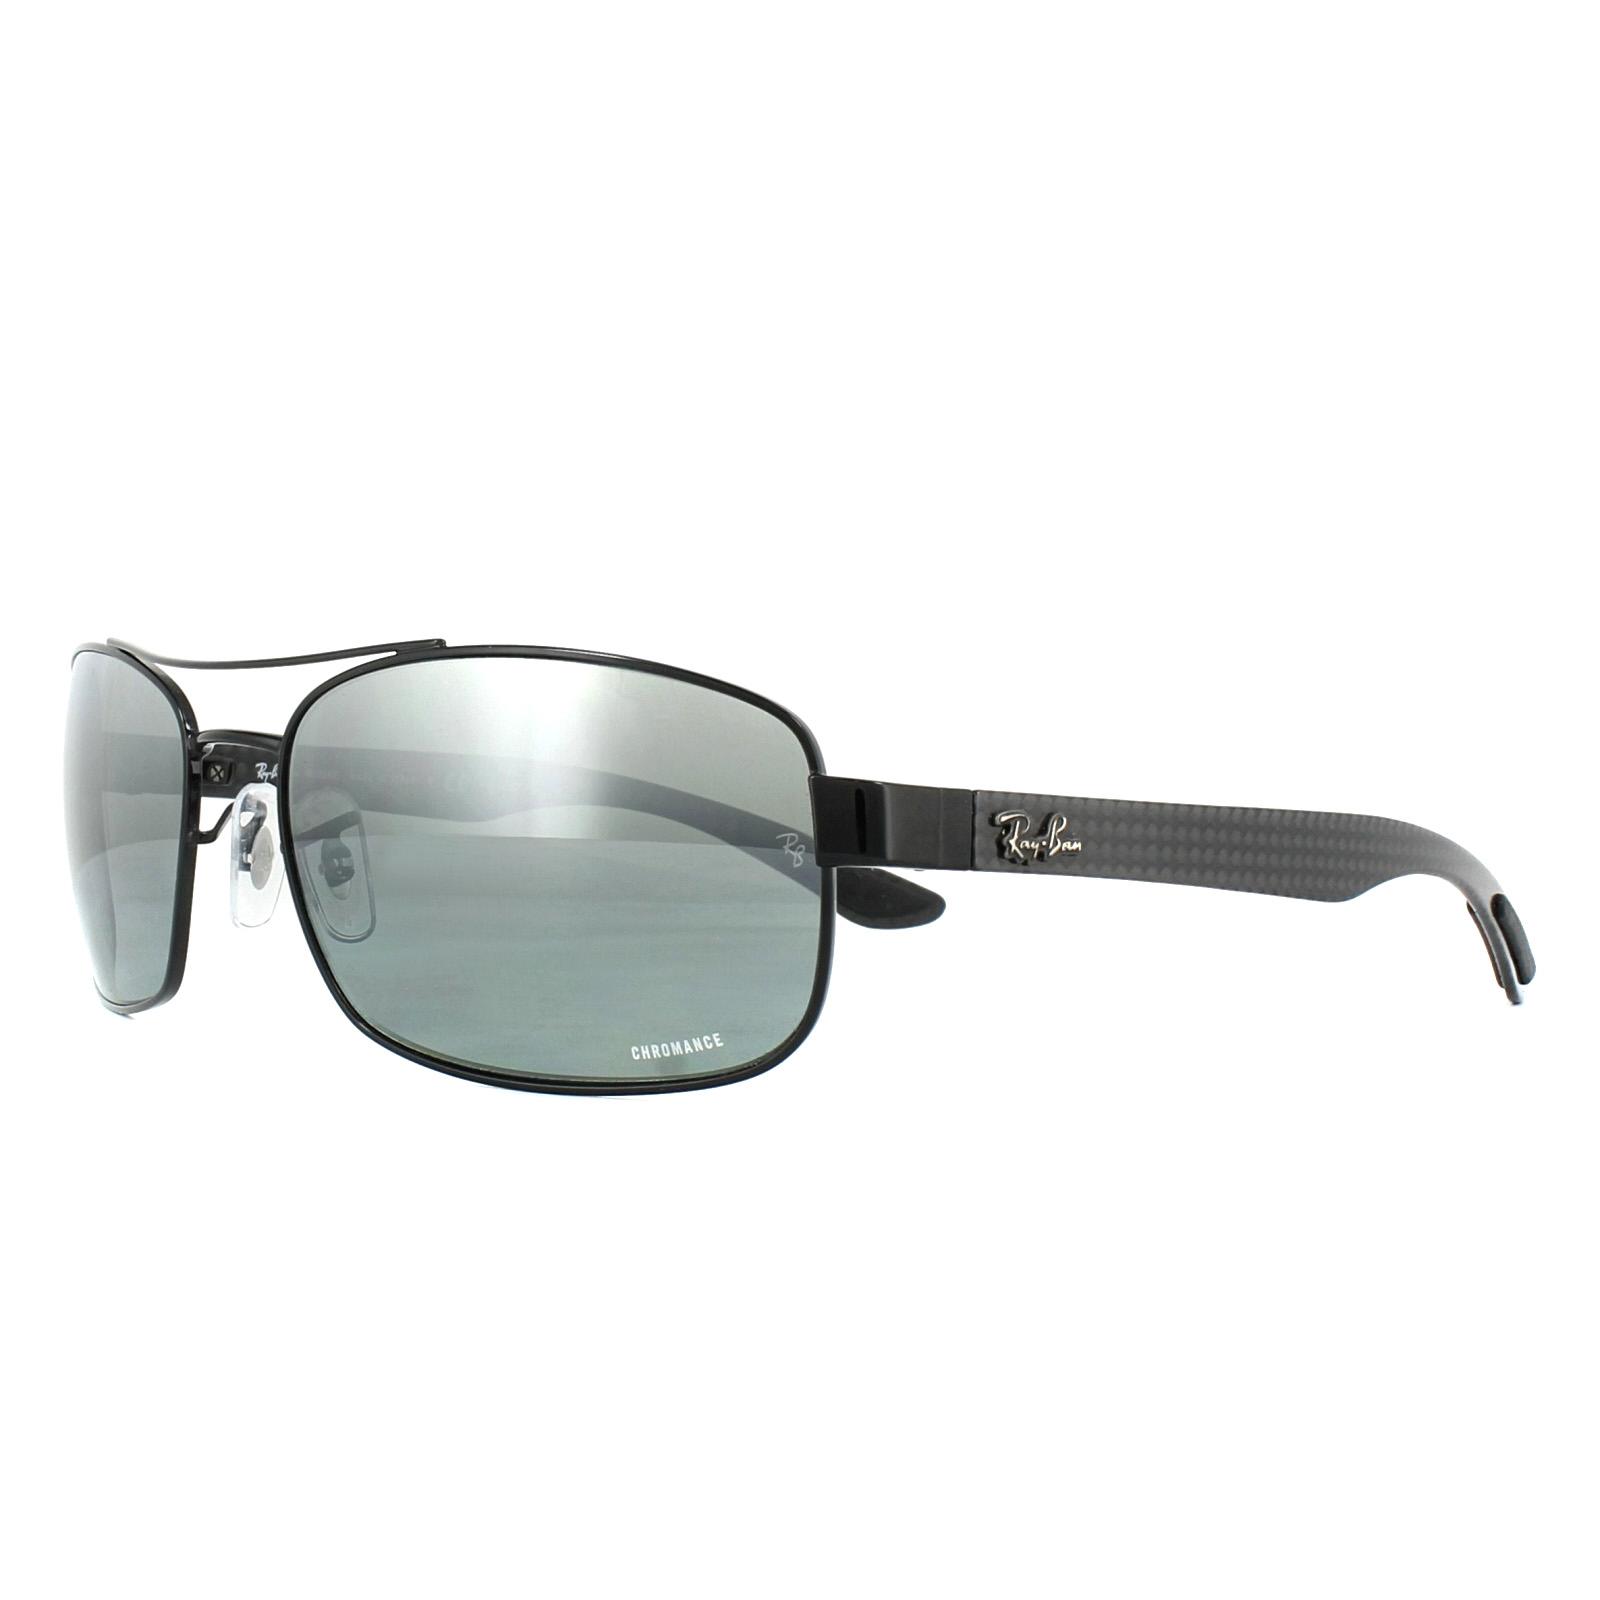 5f8b025a0f Sentinel Ray-Ban Sunglasses RB8318CH 002 5L Black Grey Mirror Polarized  Chromance